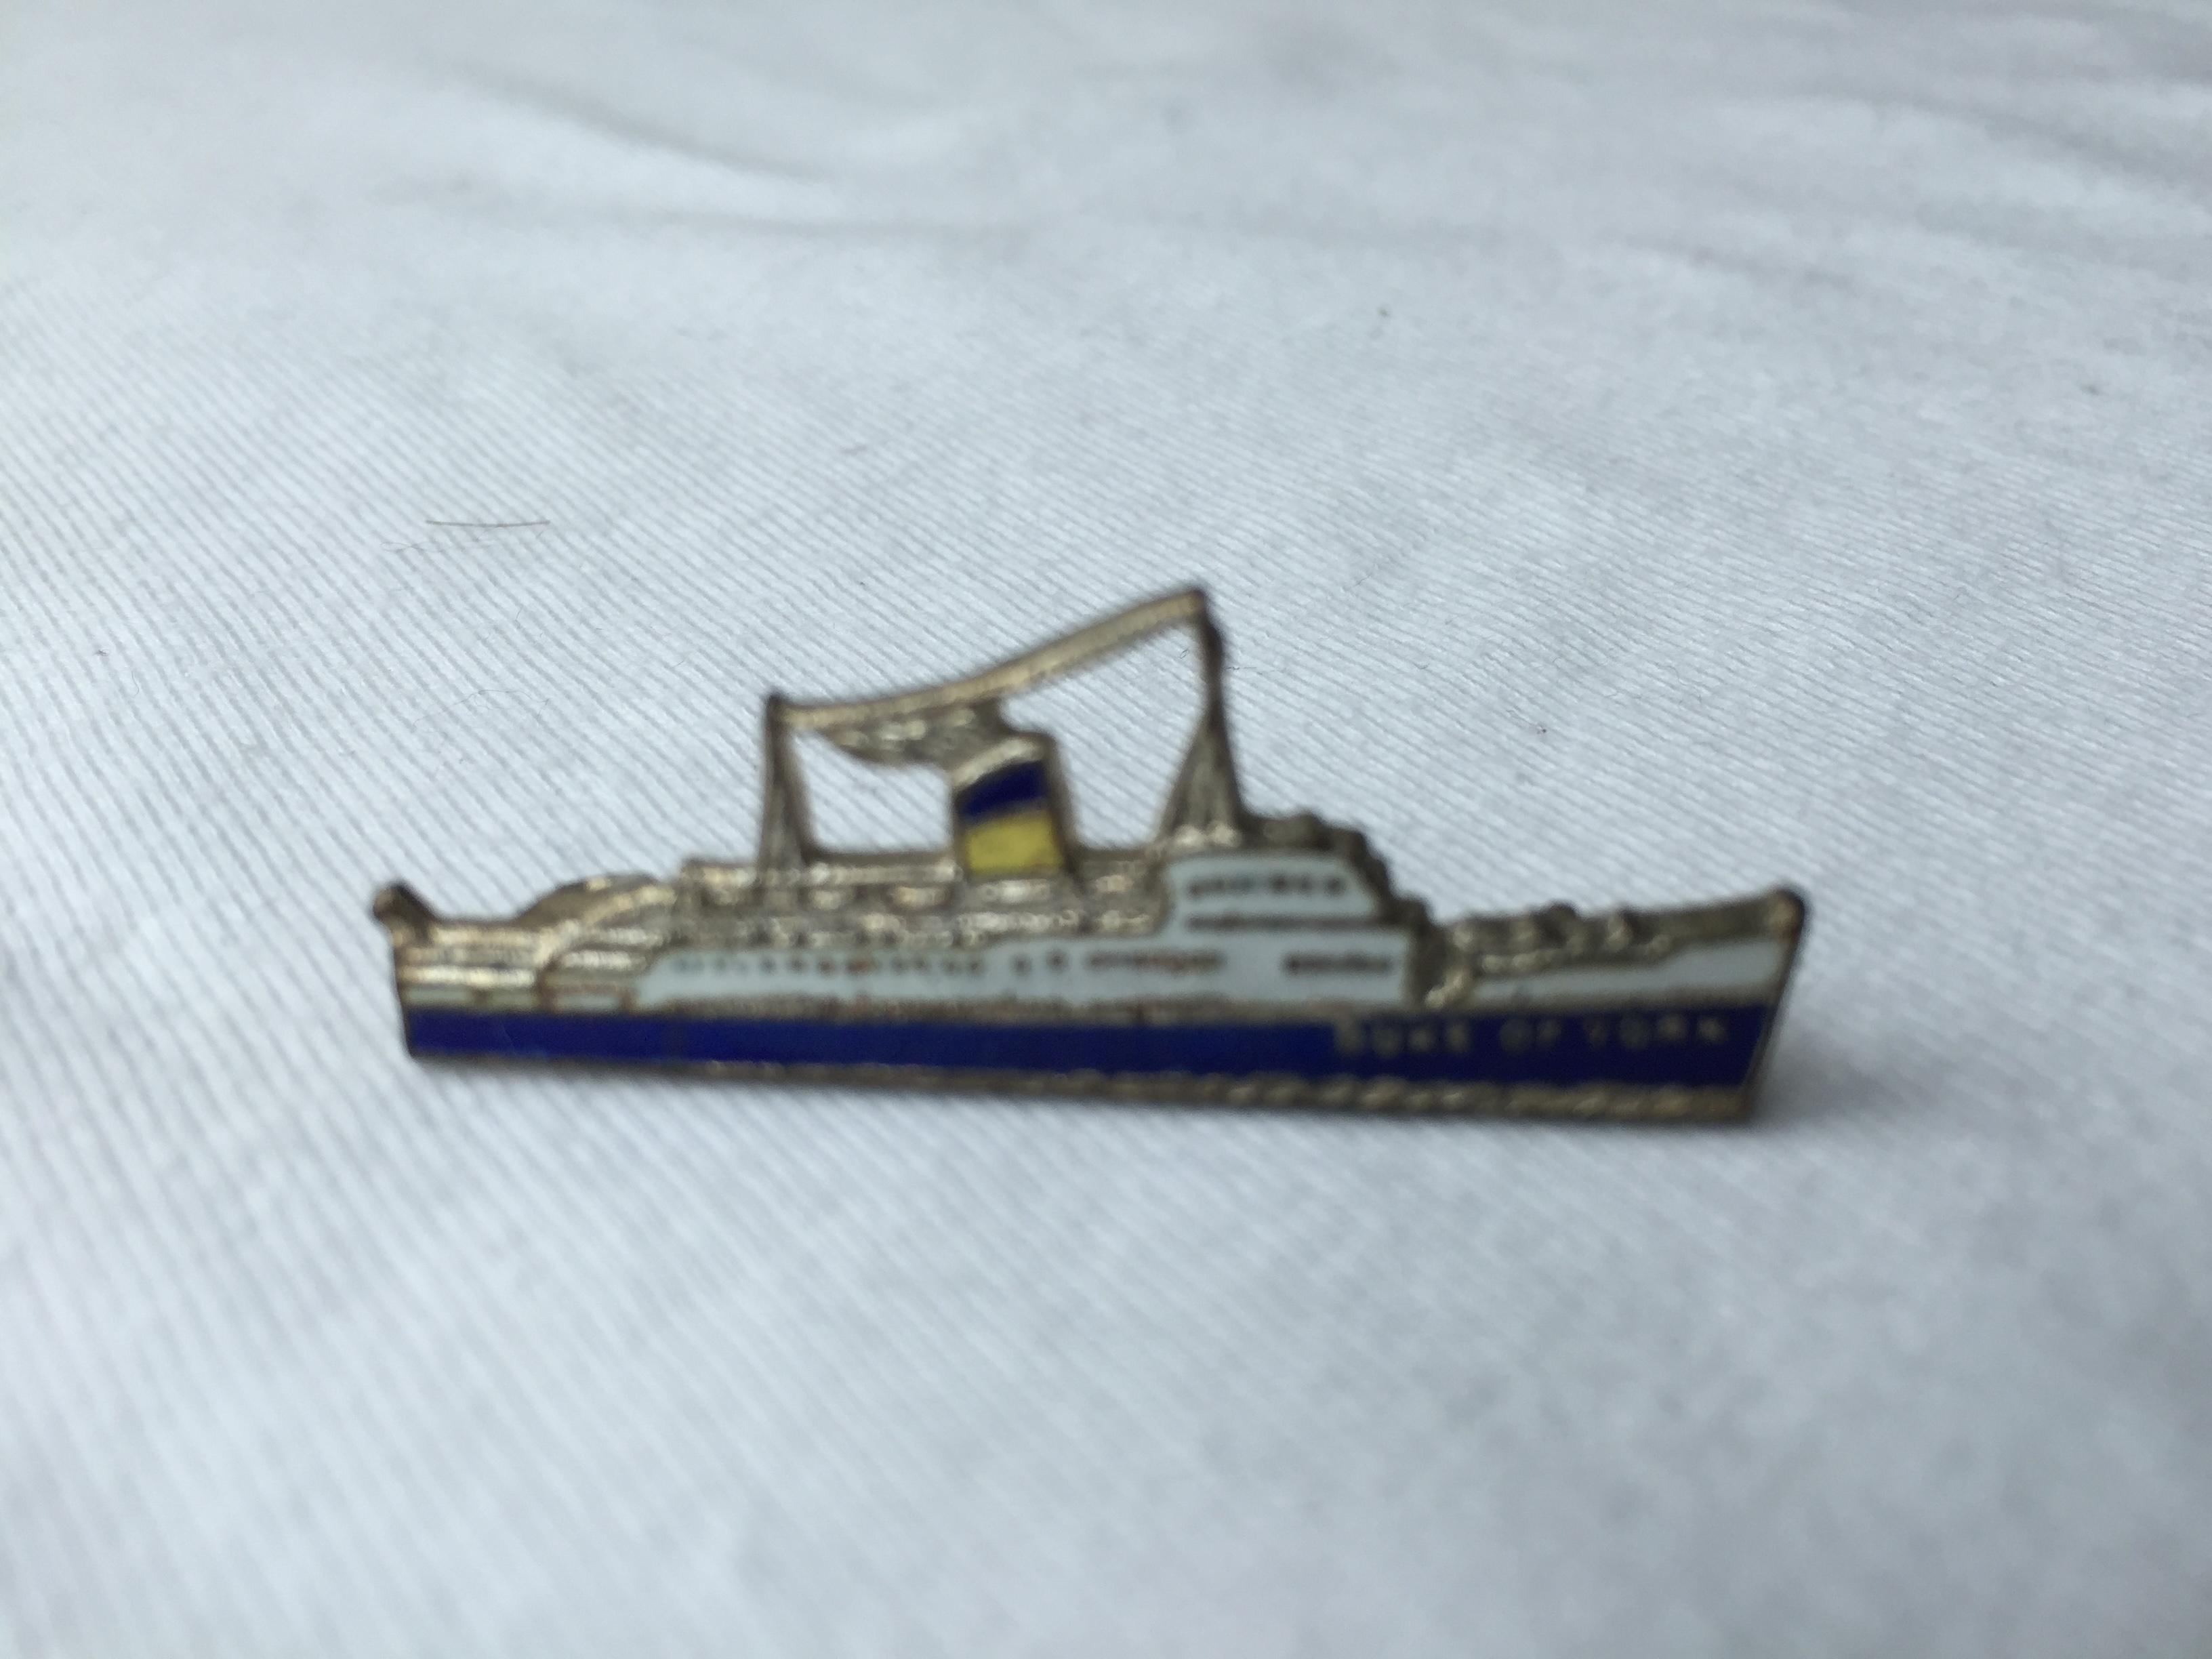 SHIP SHAPE LAPEL PIN FROM THE HARWICH HOOK FERRY VESSEL THE DUKE OF YORK